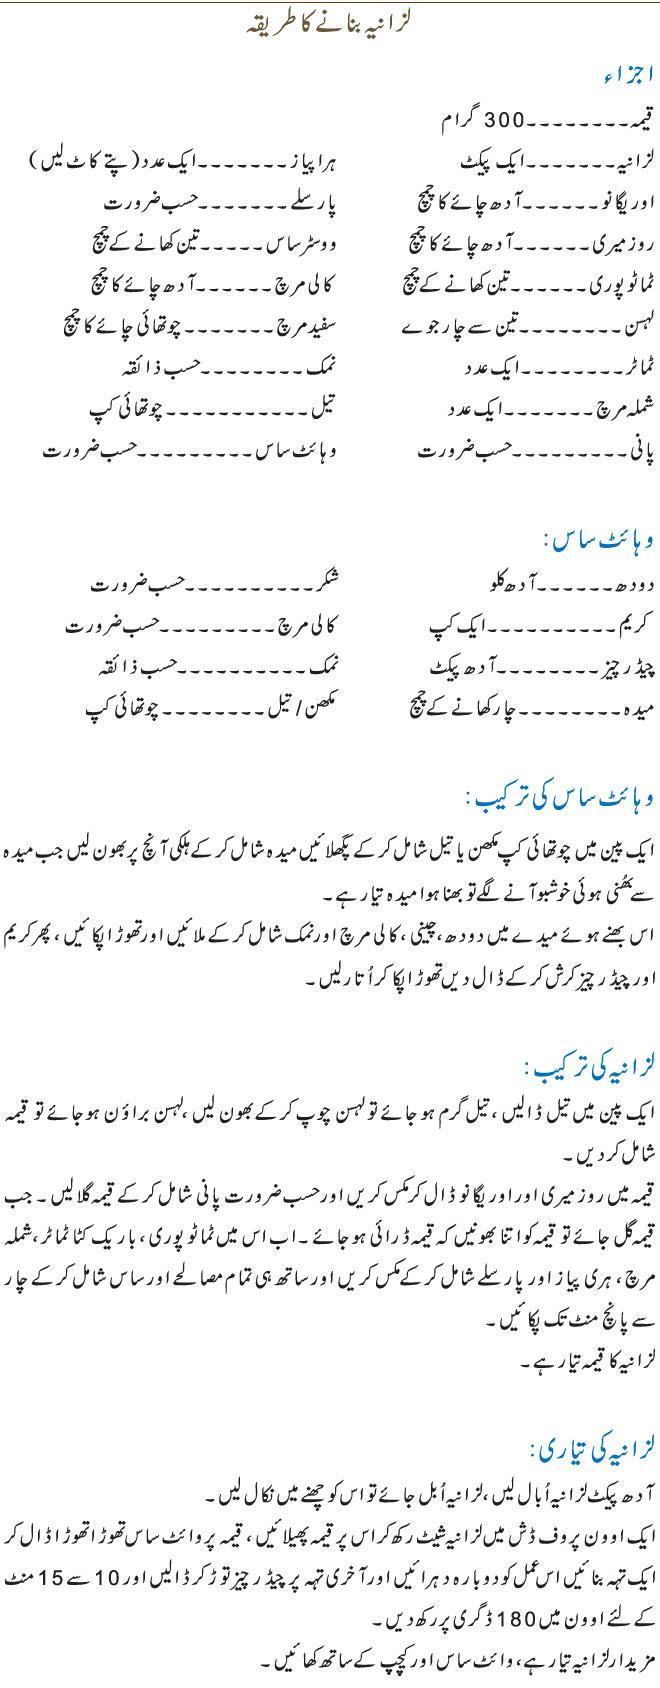 lasagna banane ka tarike Urdu